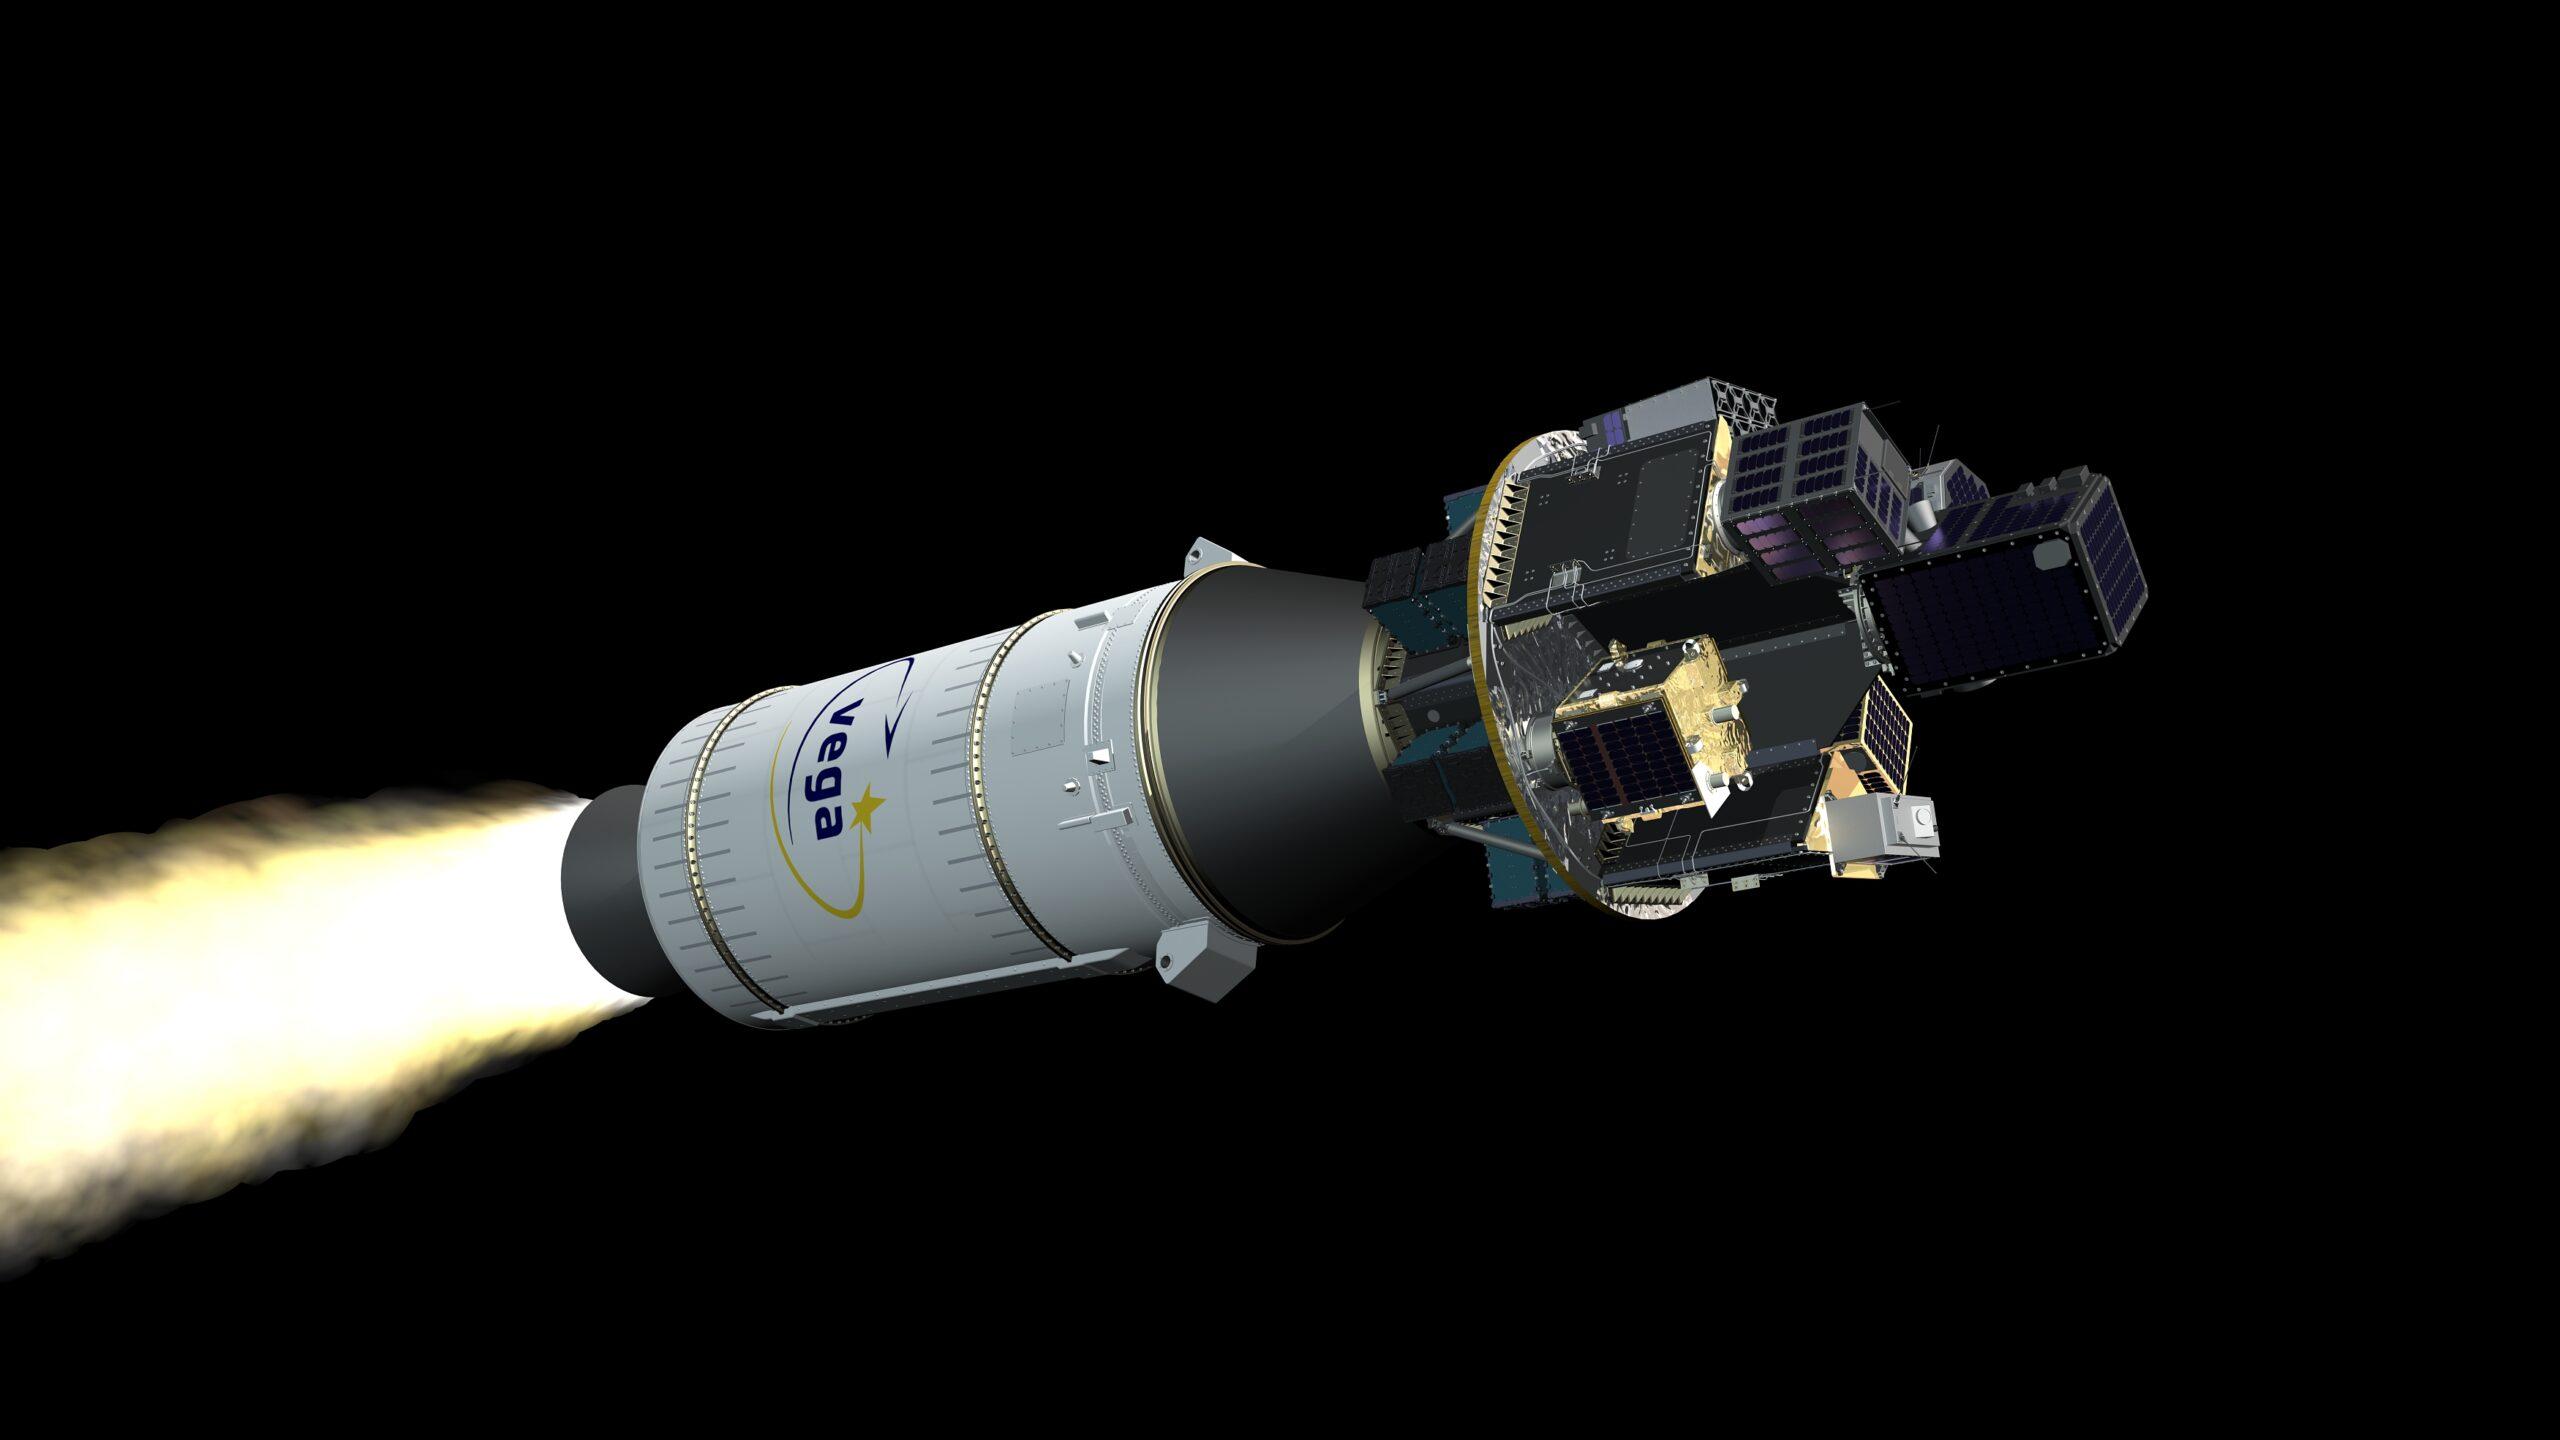 ASI - New success for the European Vega carrier